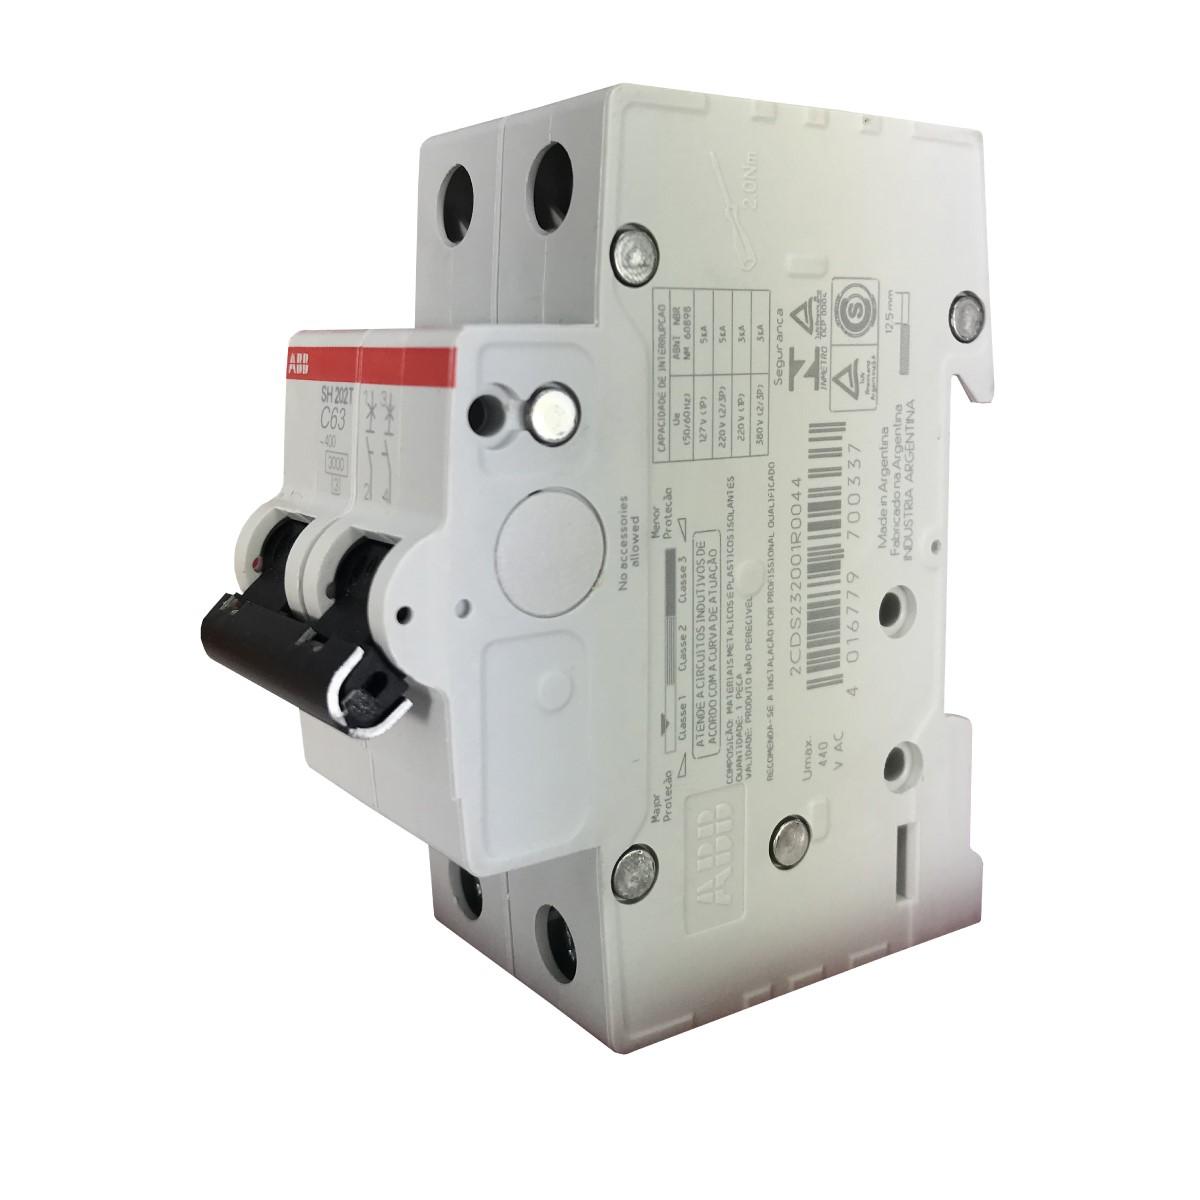 SH202 T-C63_ABB_PeR Automação Industrial